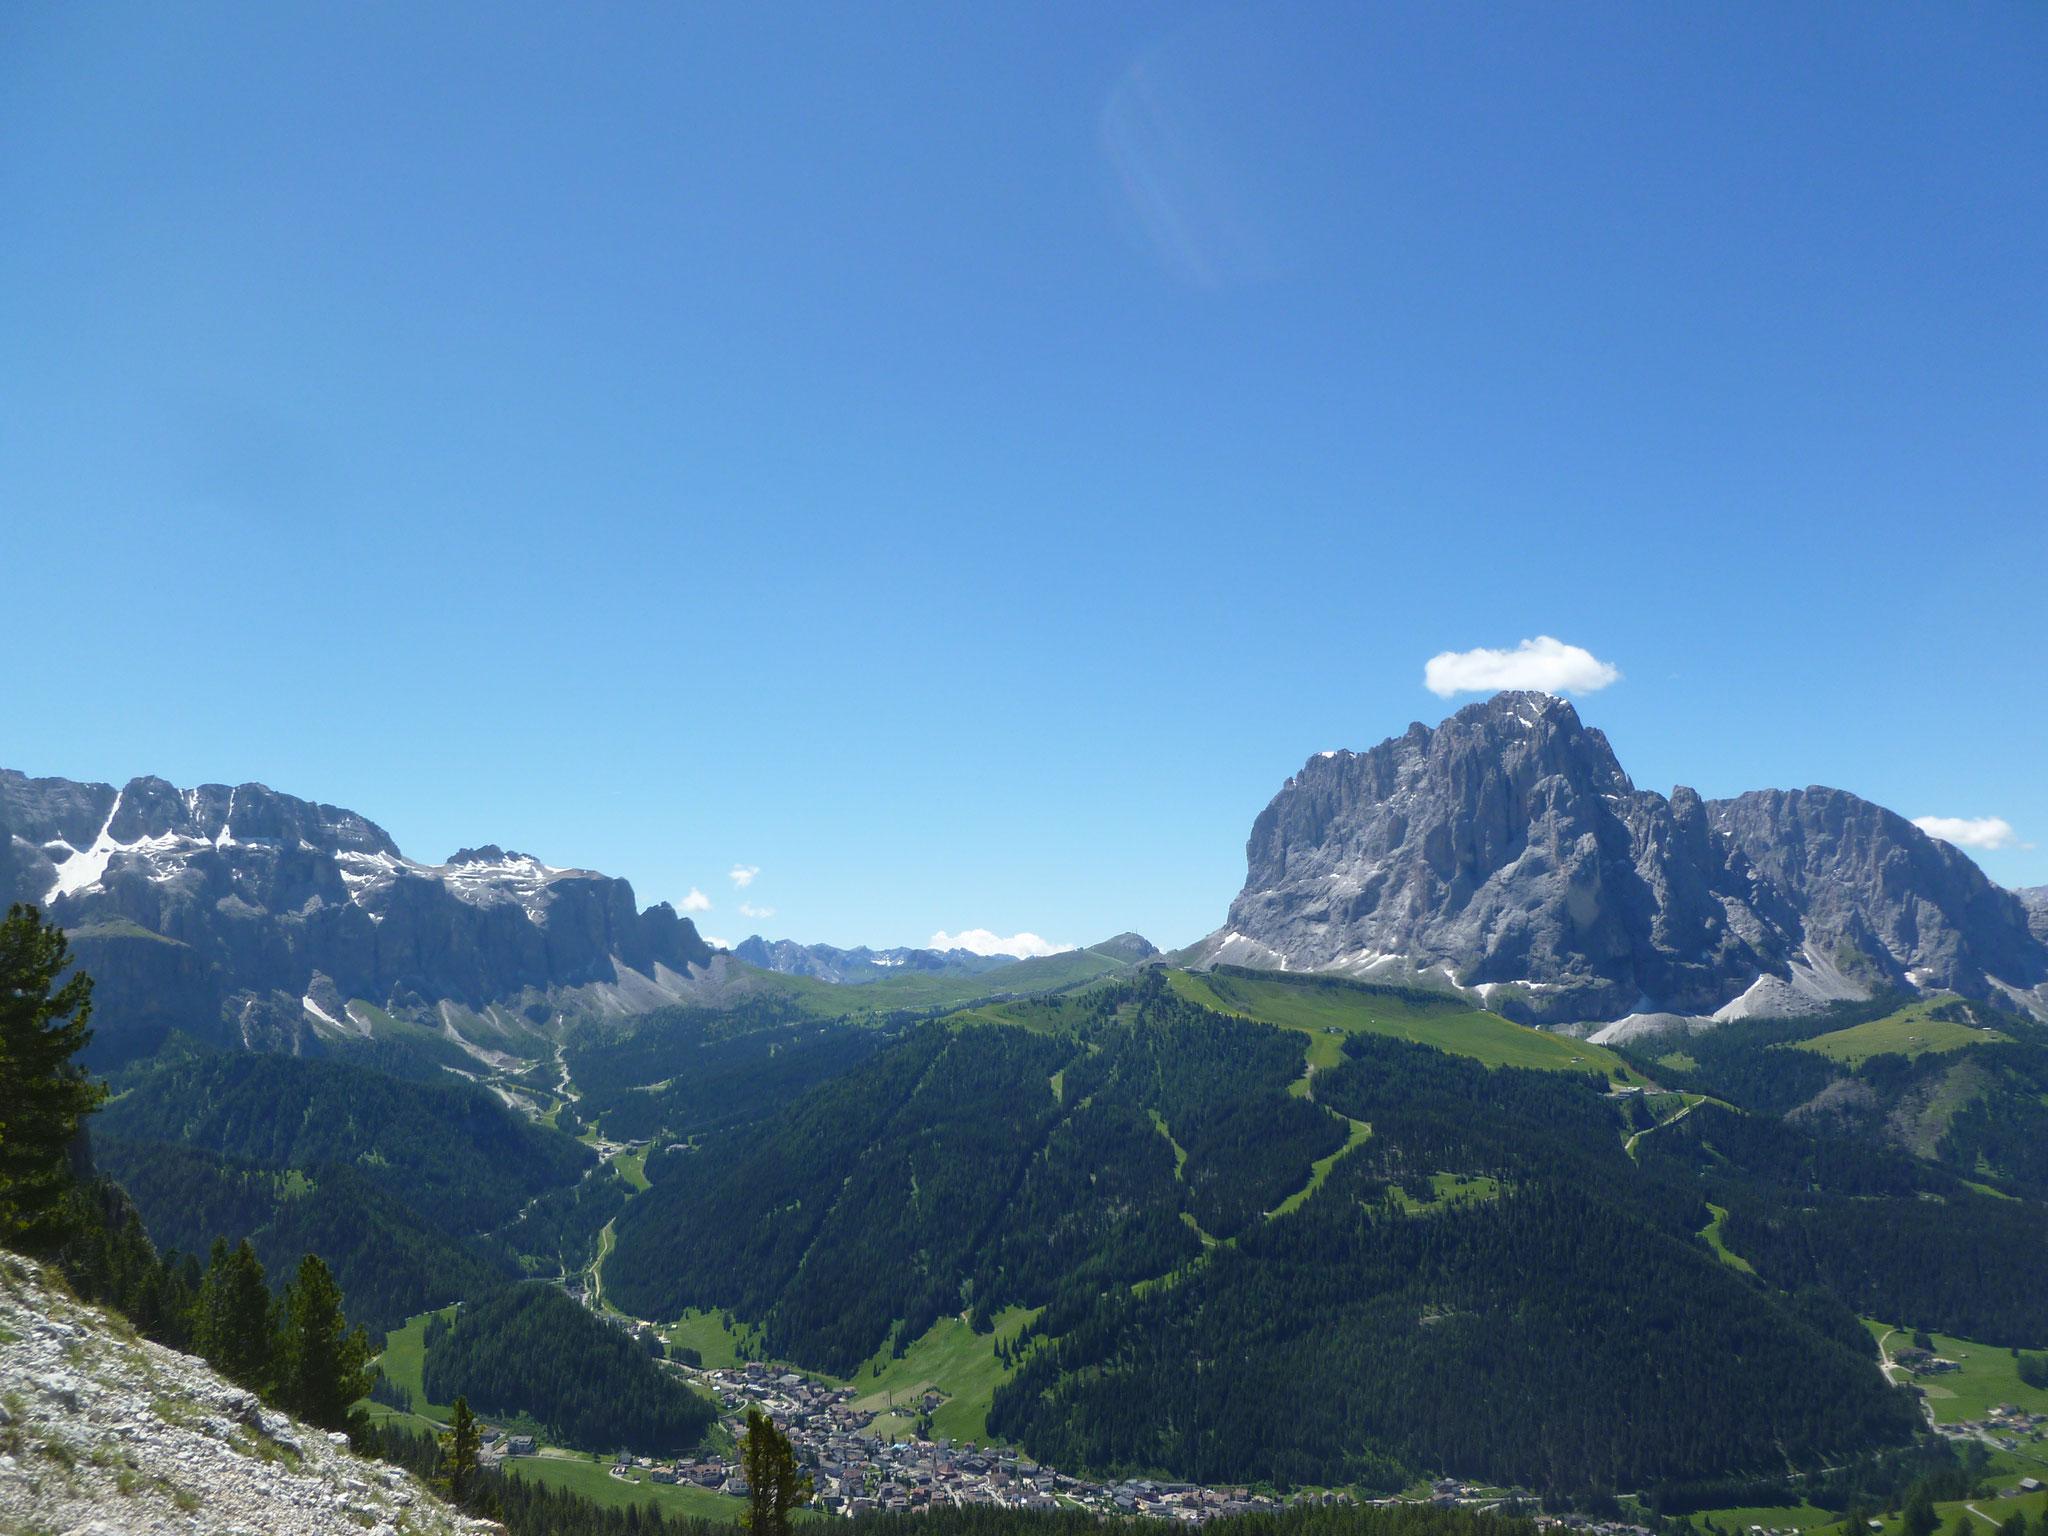 Ein Panorama wie im Prospekt; der Langkofel als thronender Blickfang